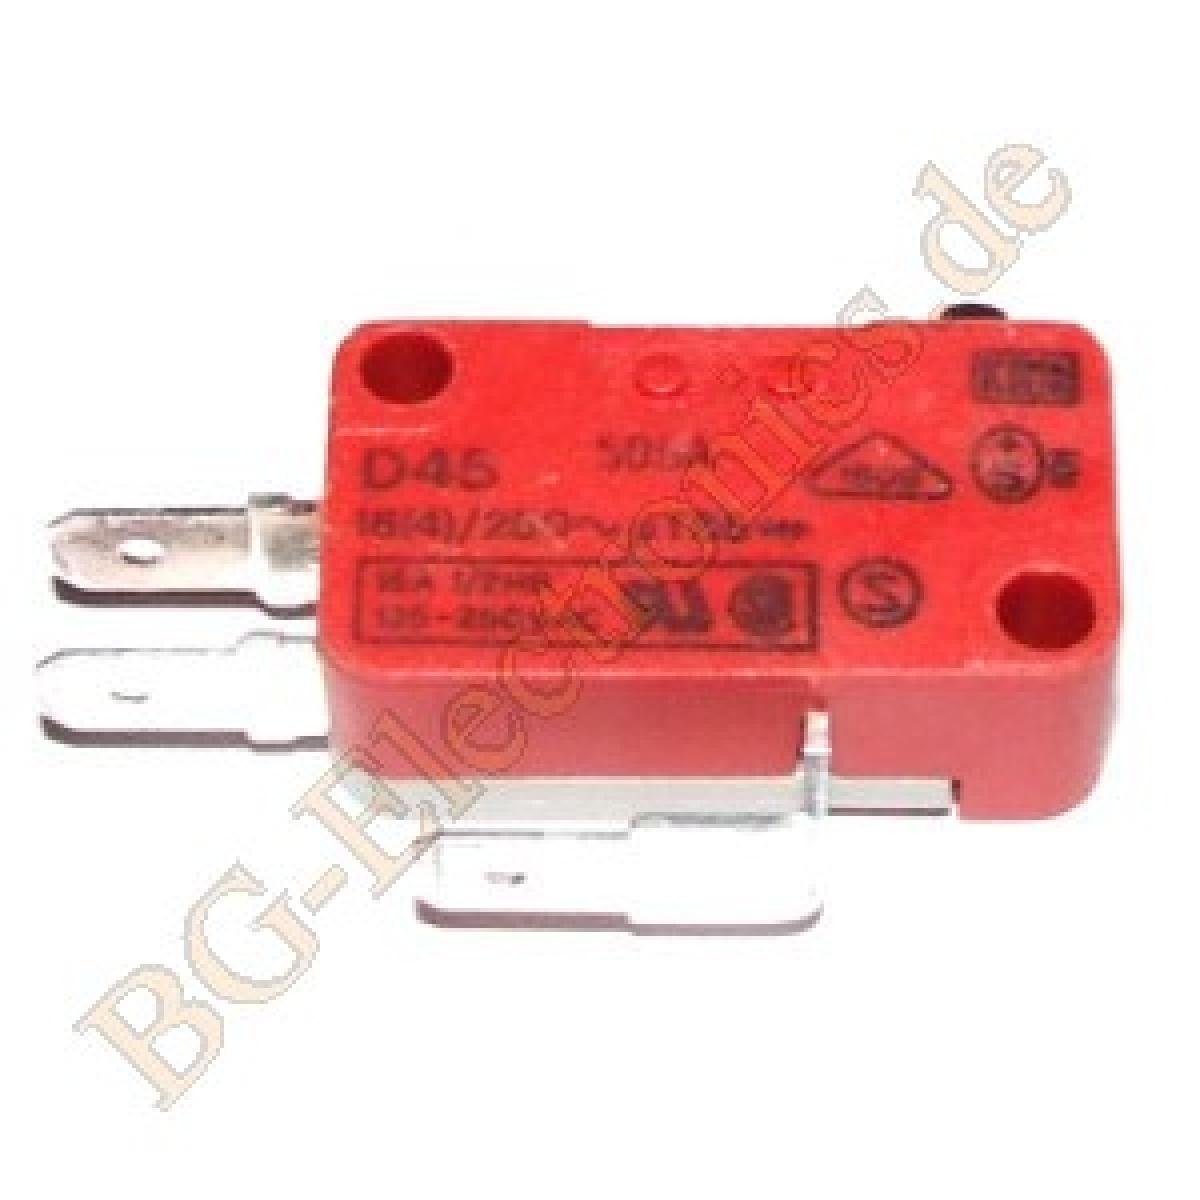 1-x-Schnappschalter-D45T85R1AA-Schnappschalter-Mikroschalter-Cherry-1pcs